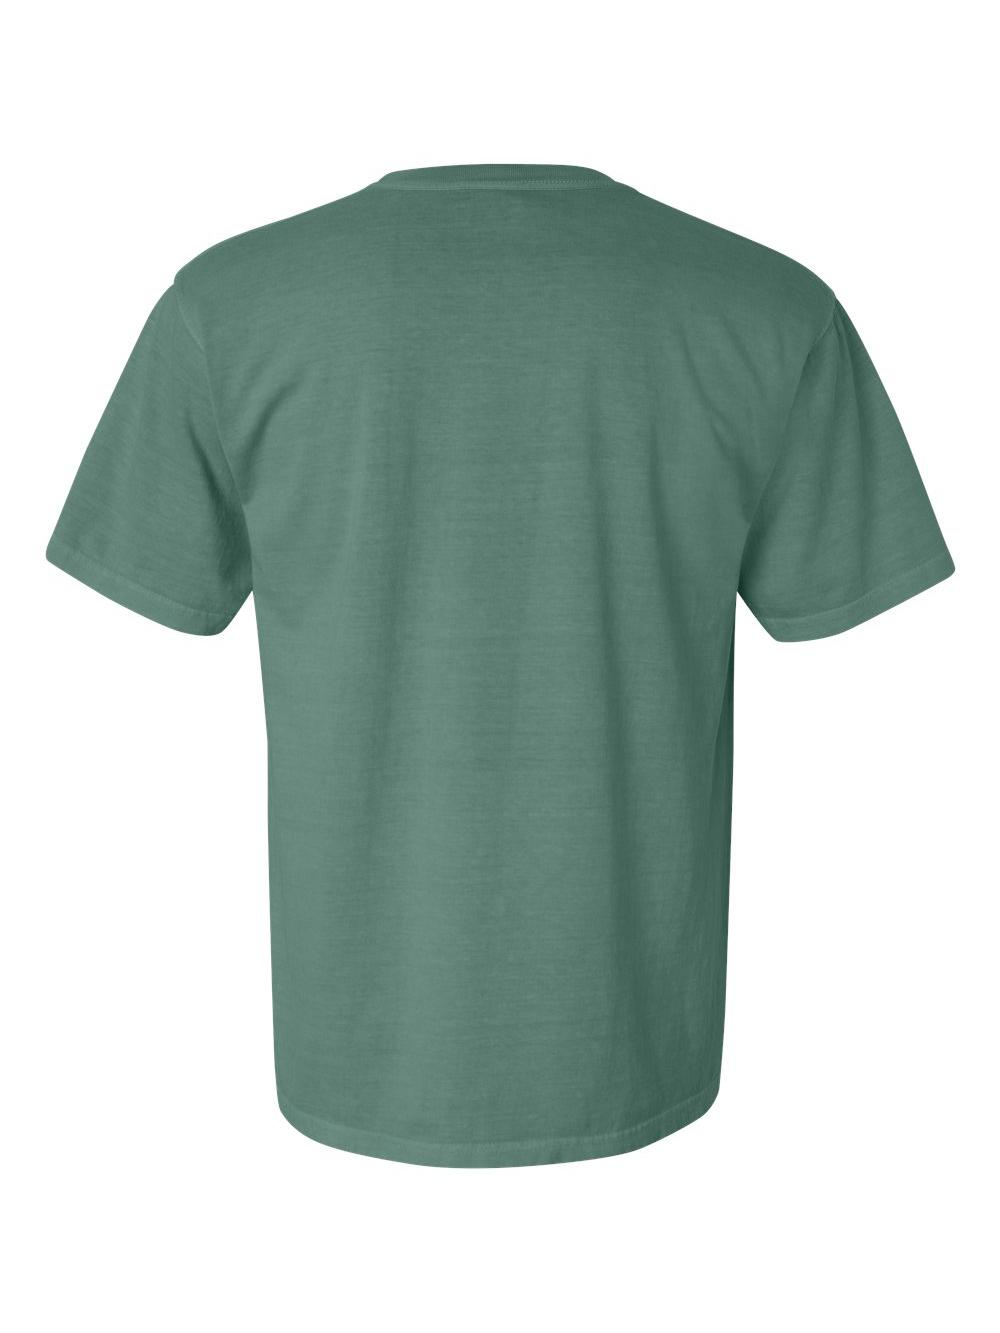 Comfort-Colors-Garment-Dyed-Heavyweight-Ringspun-Short-Sleeve-Shirt-1717 thumbnail 82